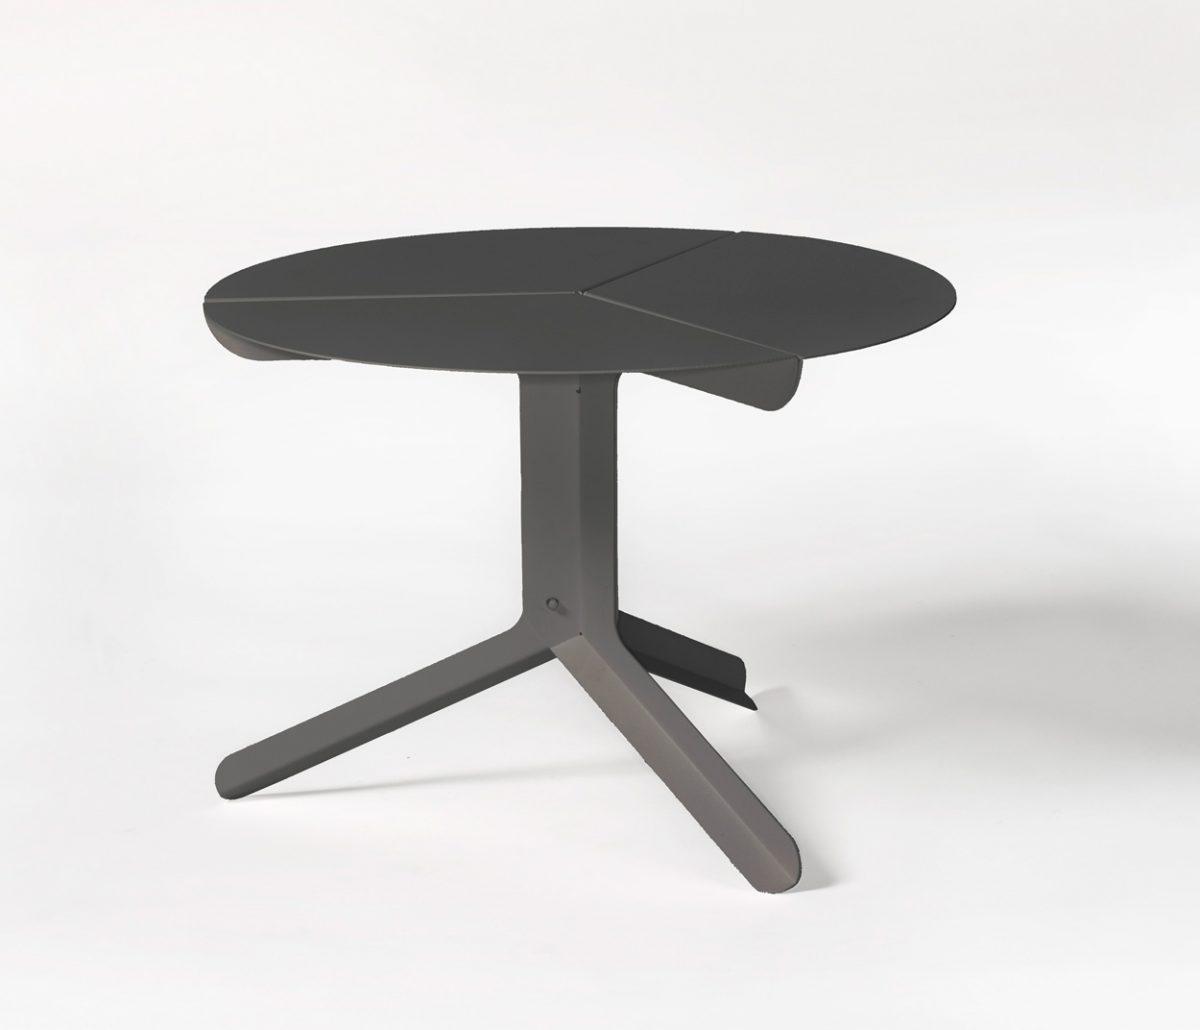 Frederik Roije for New Duivendrecht sliced table low bijzettafel zwart – gimmii shop Dutch design